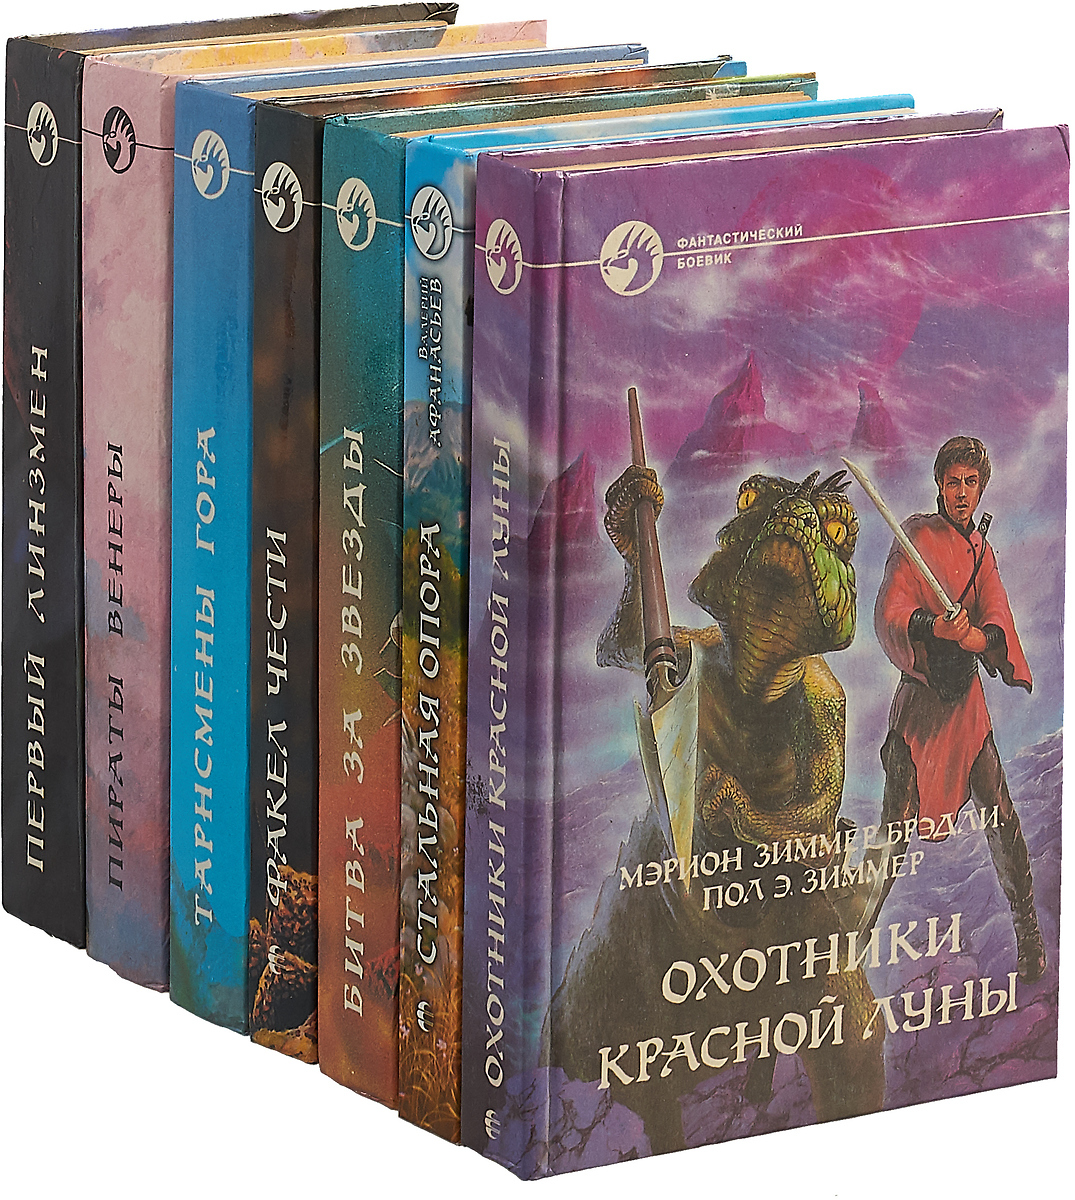 Серия Фантастический боевик (комплект из 10 книг ) серия боевик от александра мазина комплект из 6 книг